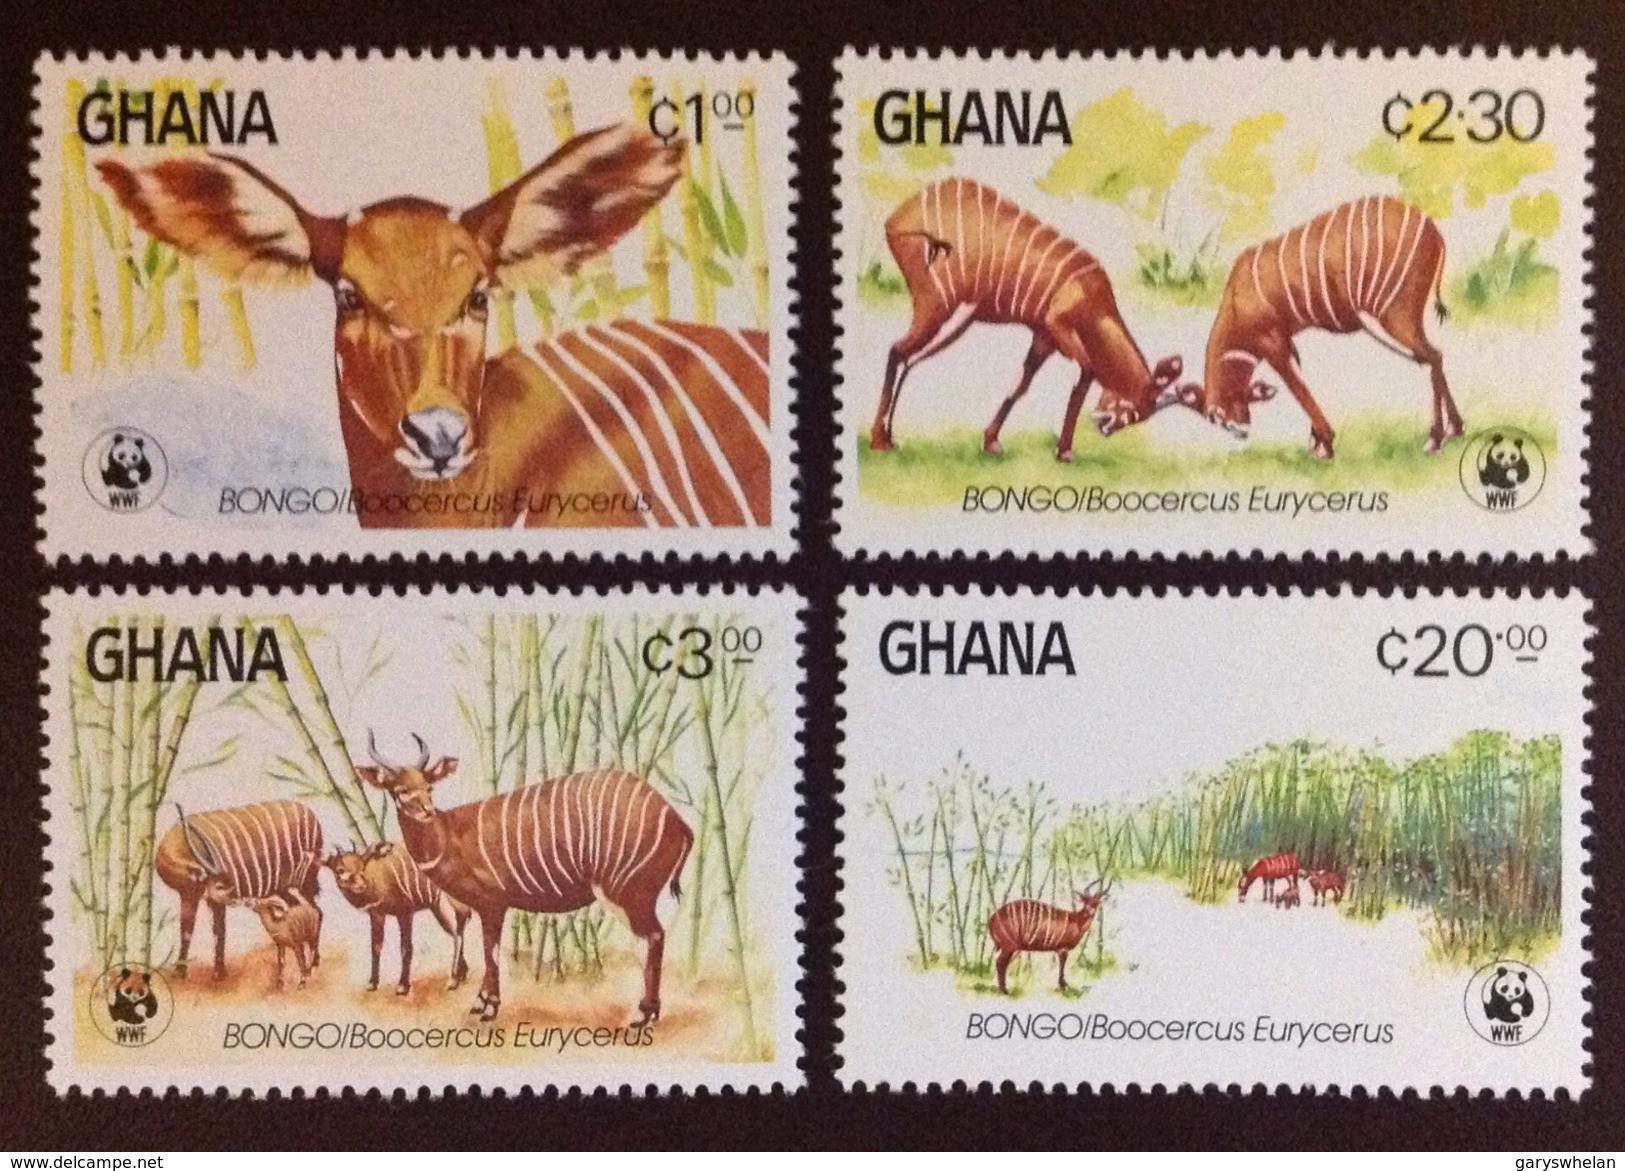 Ghana 1984 WWF Endangered Antelopes Animals Bongo MNH - Unclassified